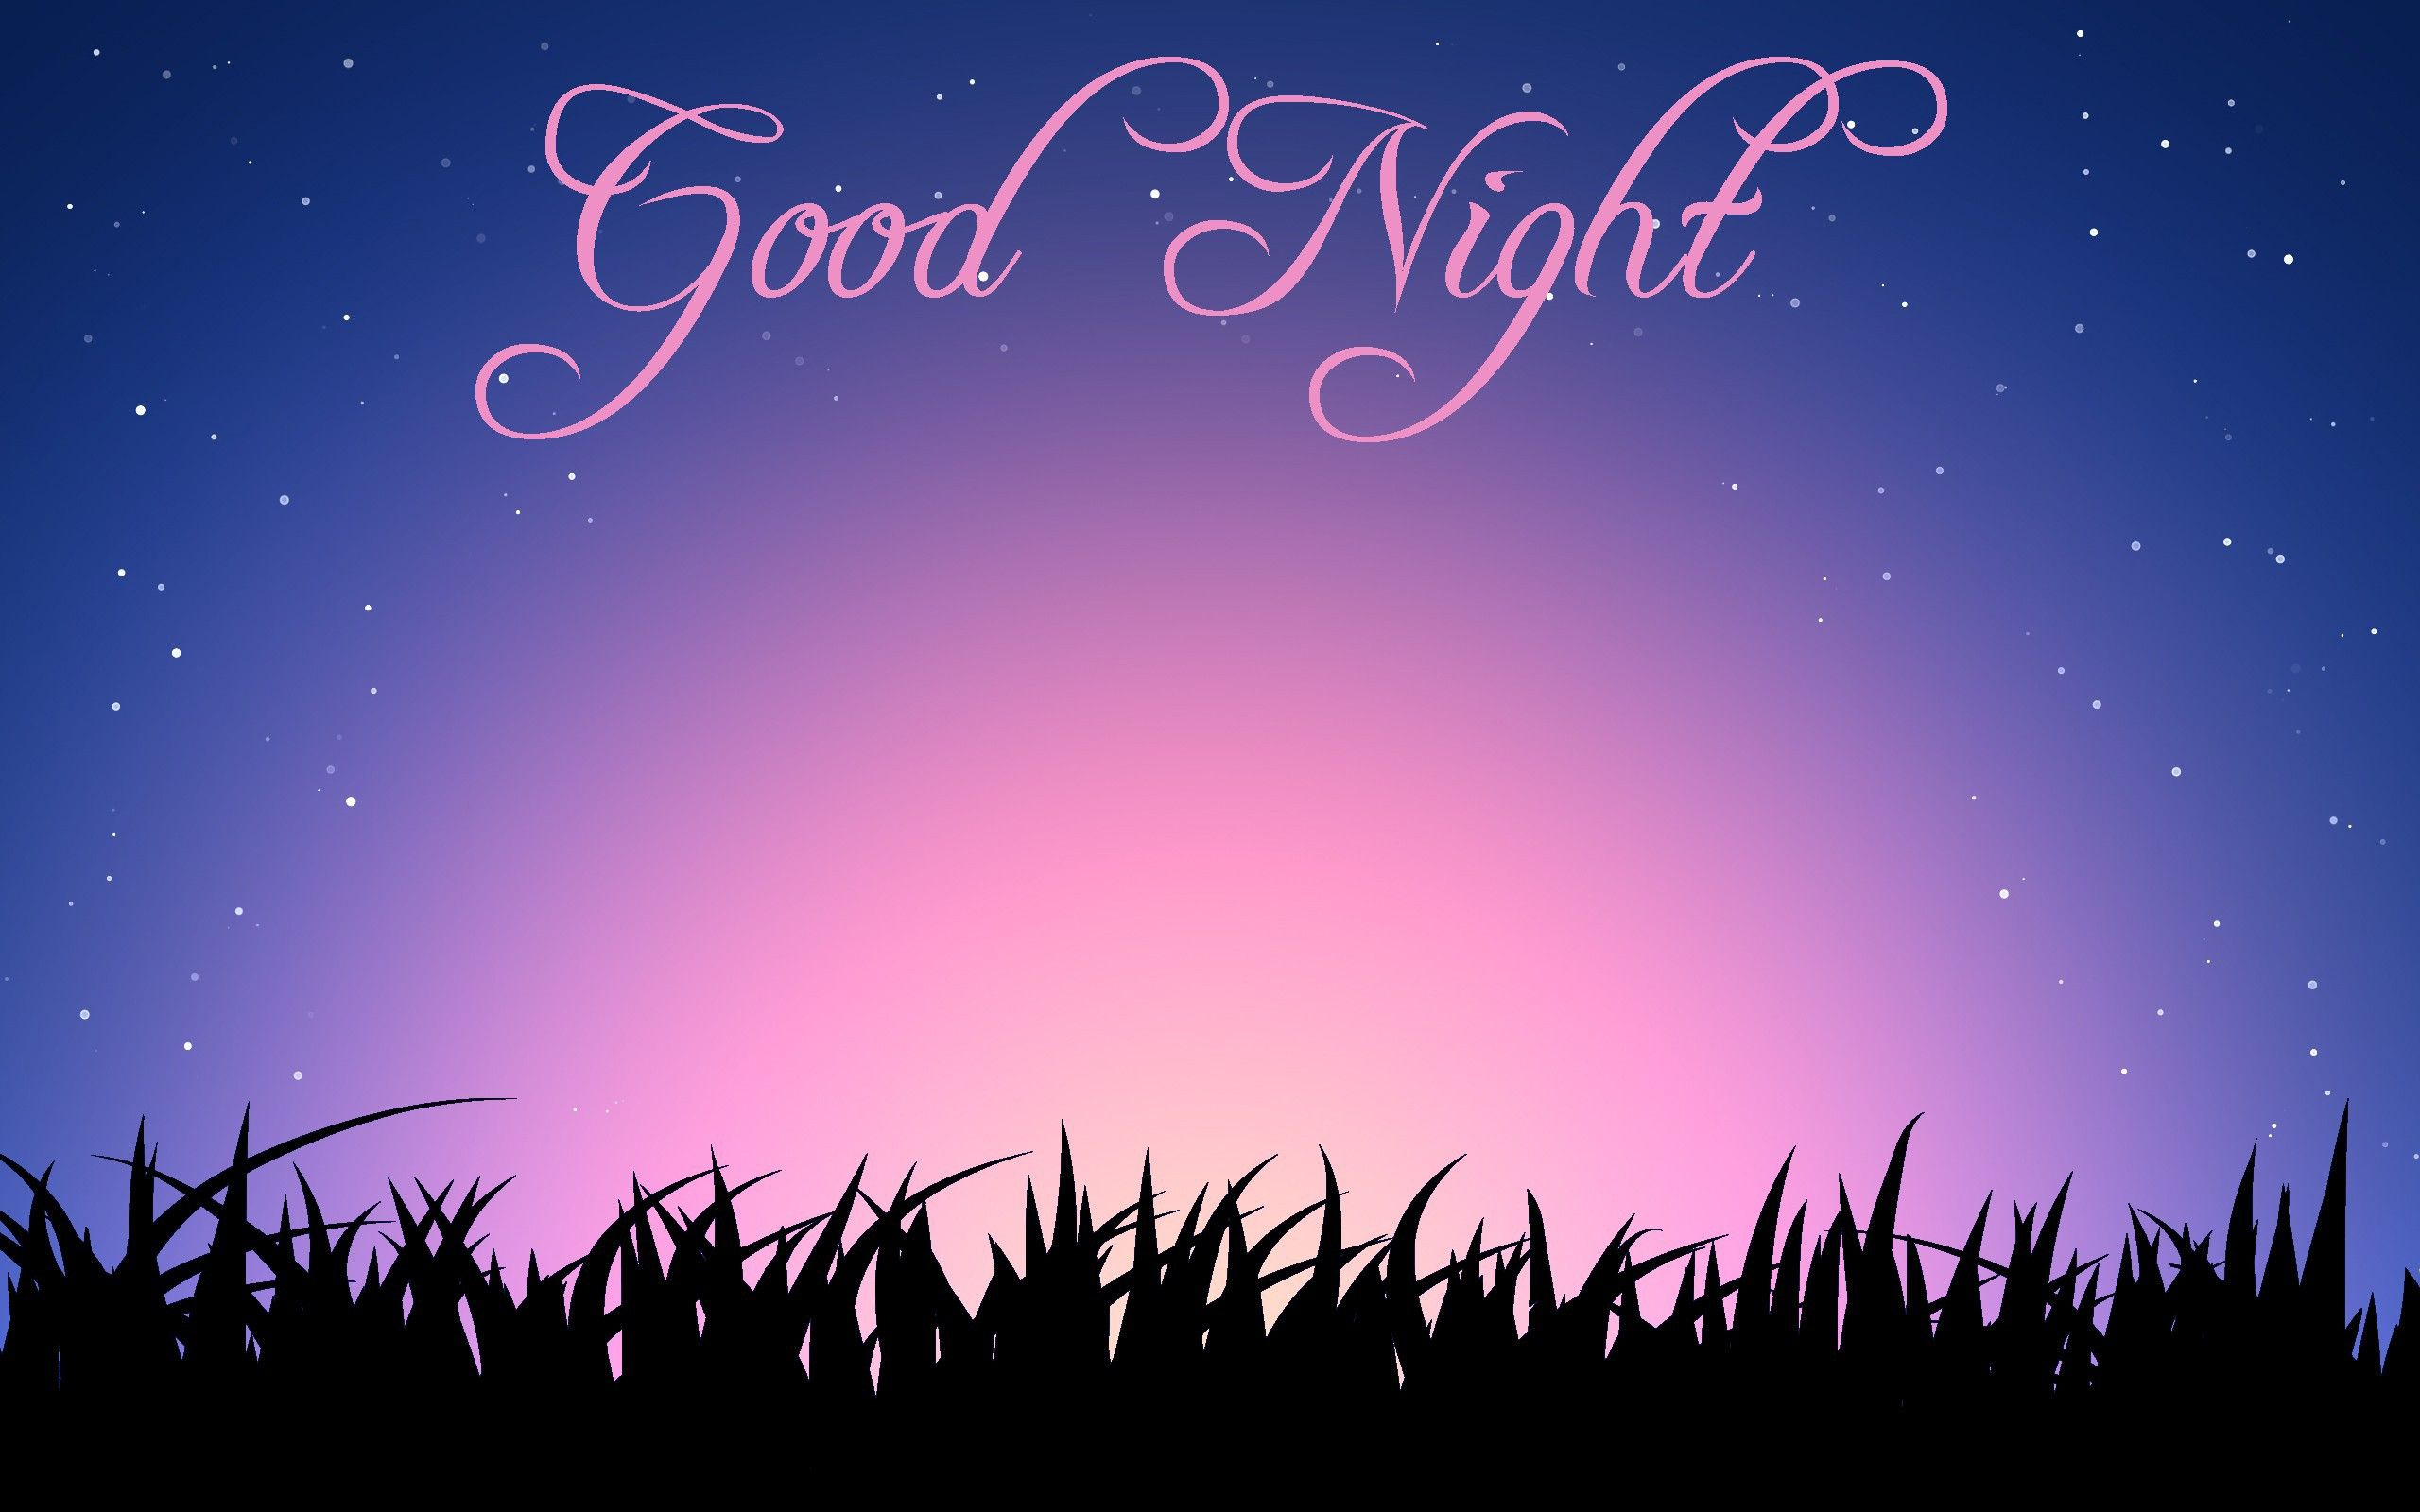 Hd wallpaper whatsapp - Wallpaper Download For Whatsapp Free New Good Night Desktop Hd Wallpapers Whatsapp Download